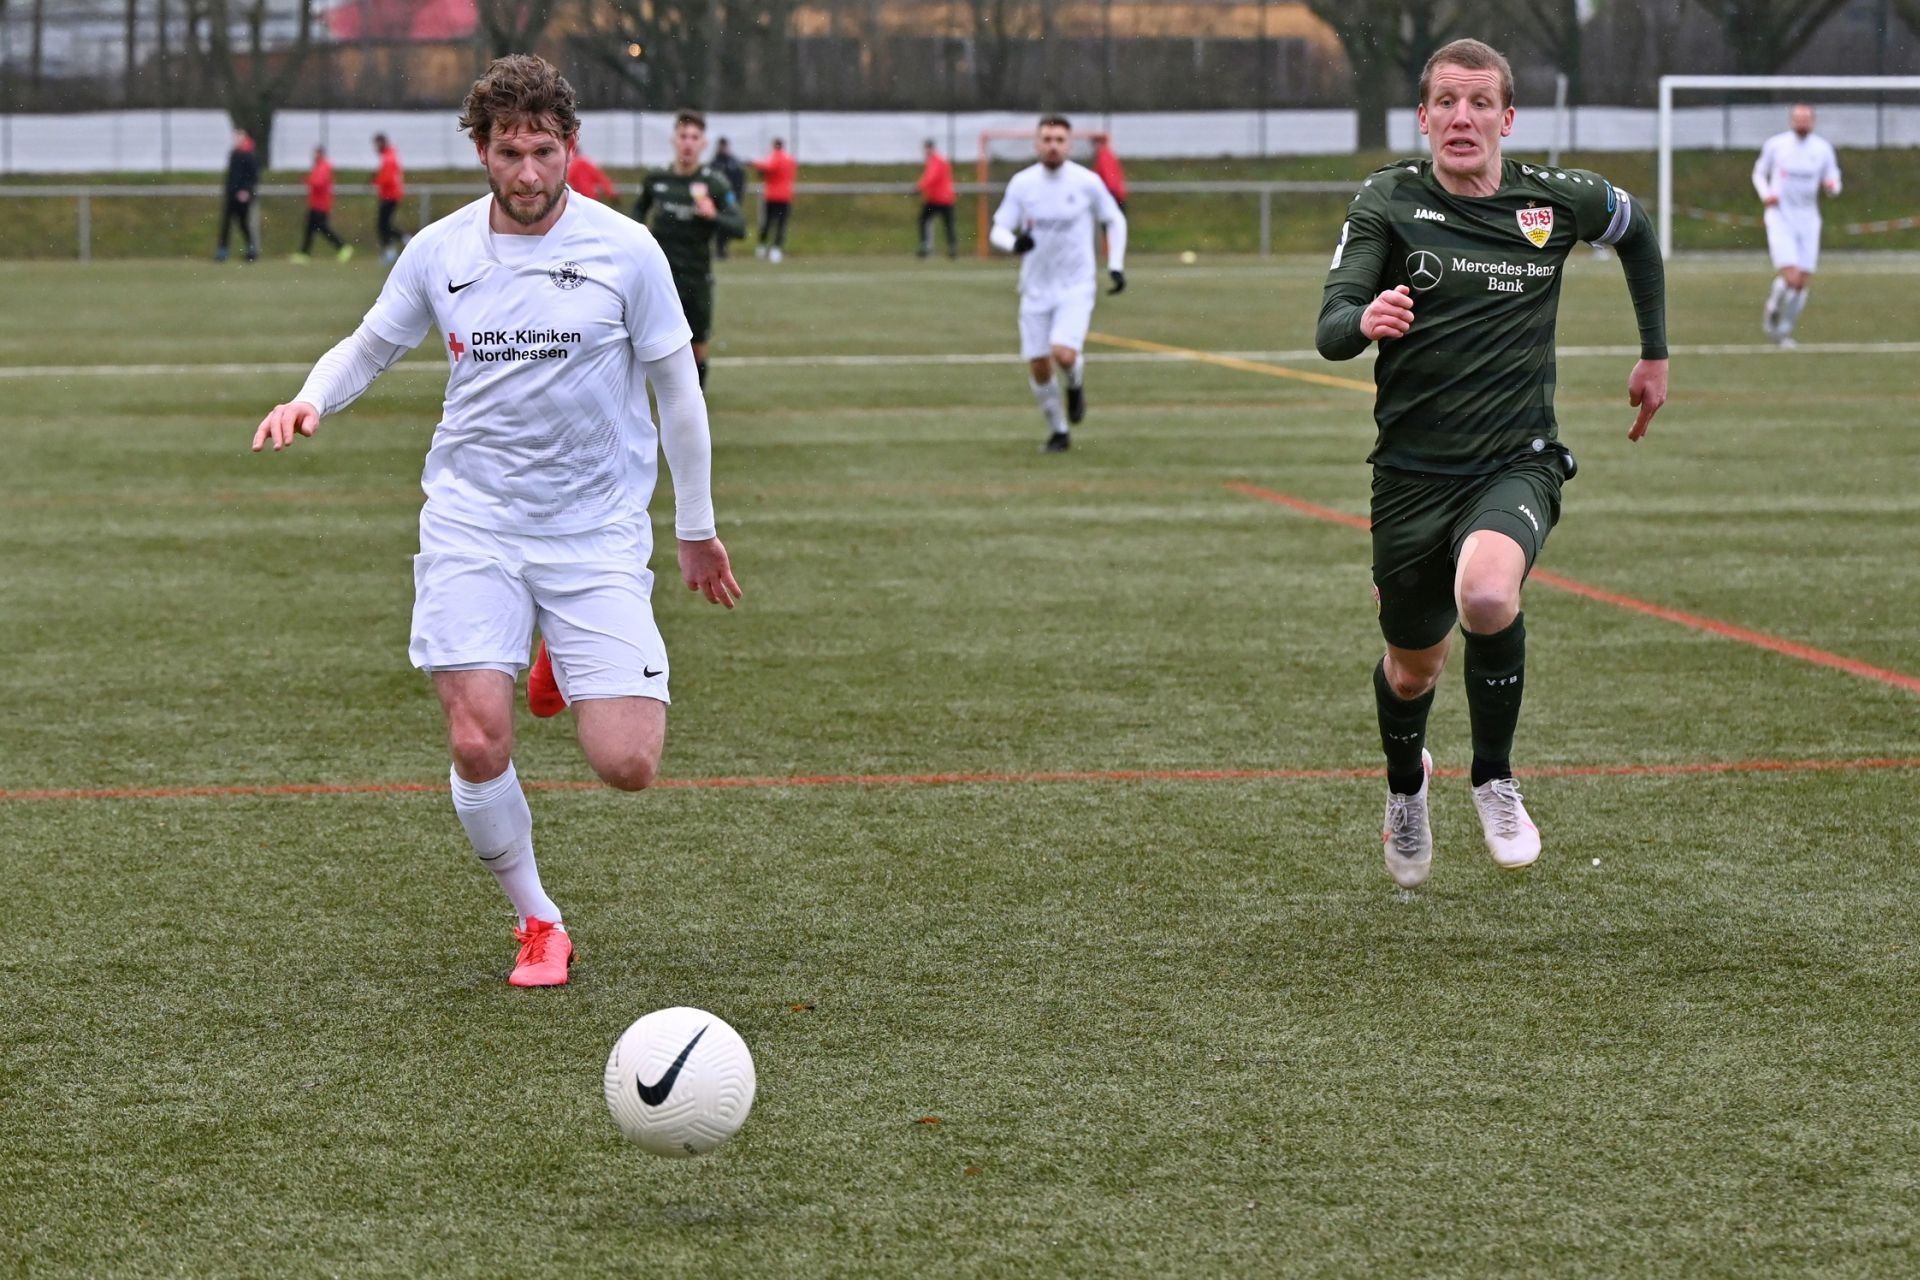 Regionalliga S�dwest 2020/21, KSV Hessen Kassel, VfB Stuttgart II, Endstand 0:4